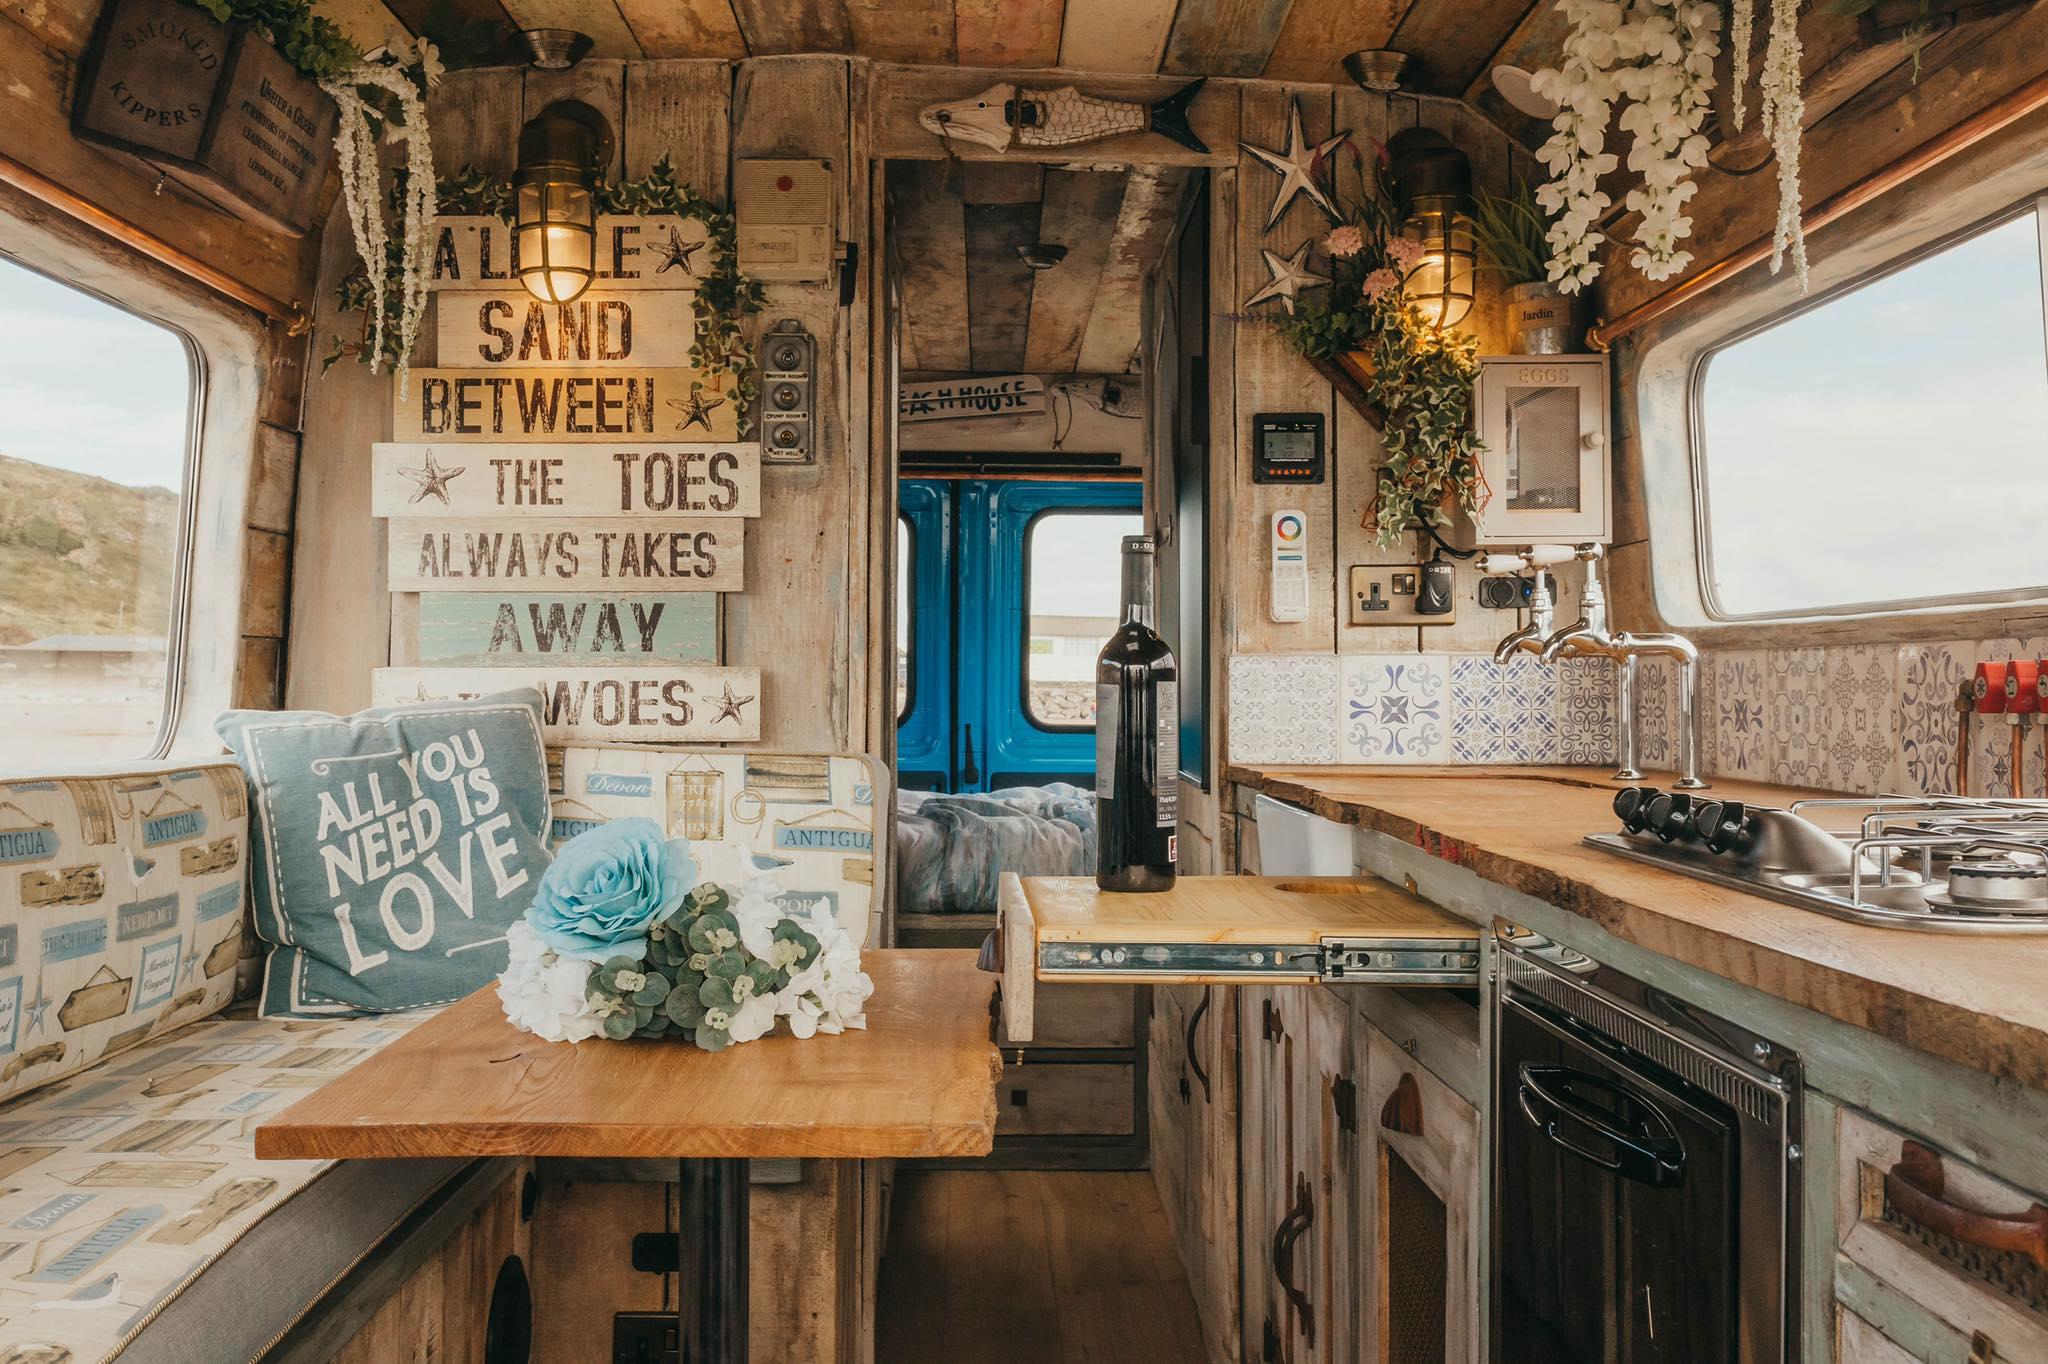 interior view of ernie by supertramped campervan kitchen with wine rack